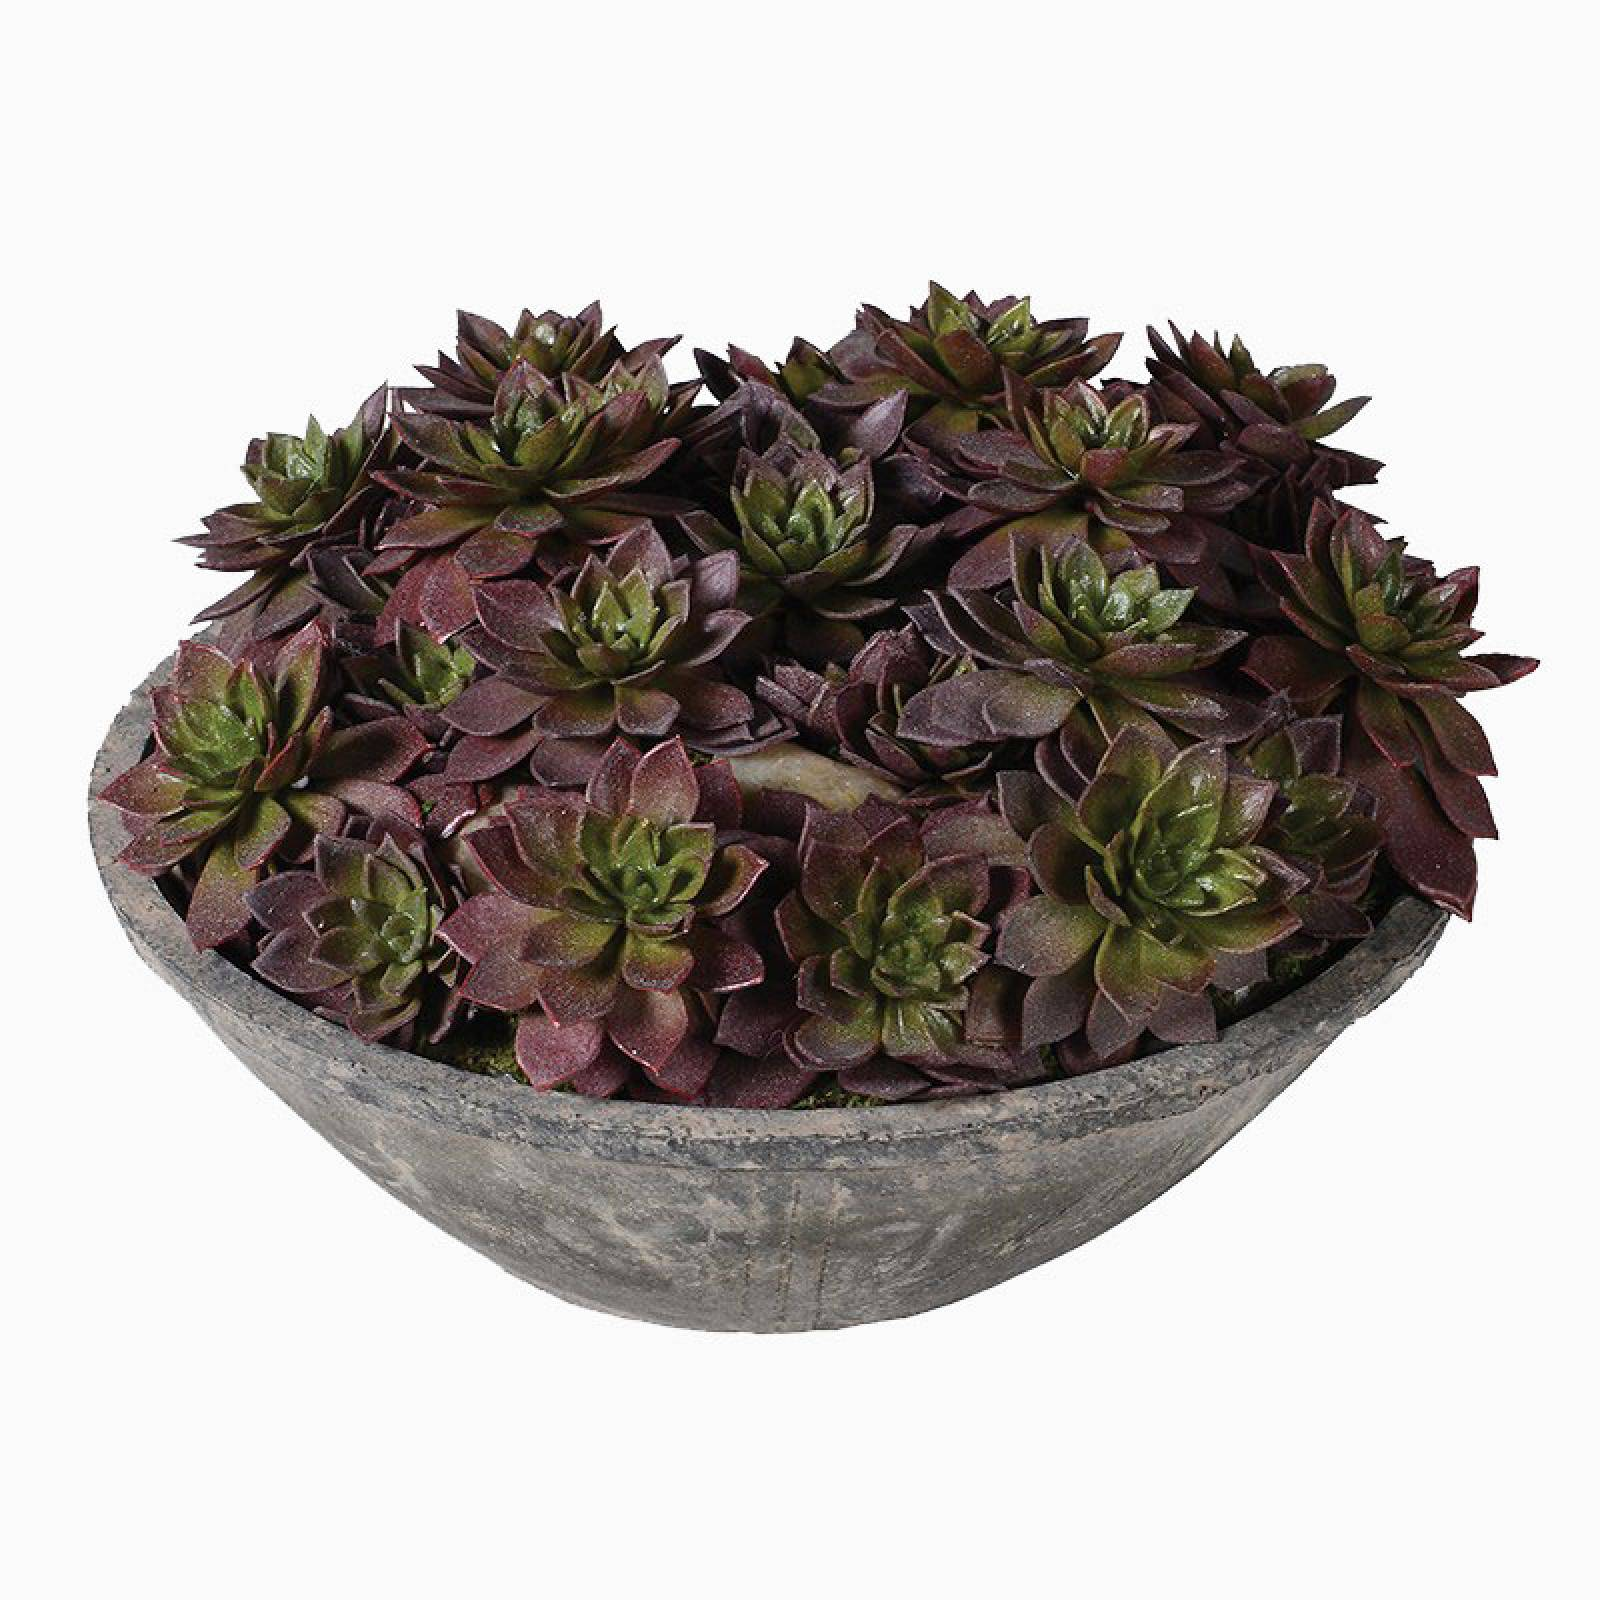 Echeveria Artificial Succulent Plants In Cement Bowl